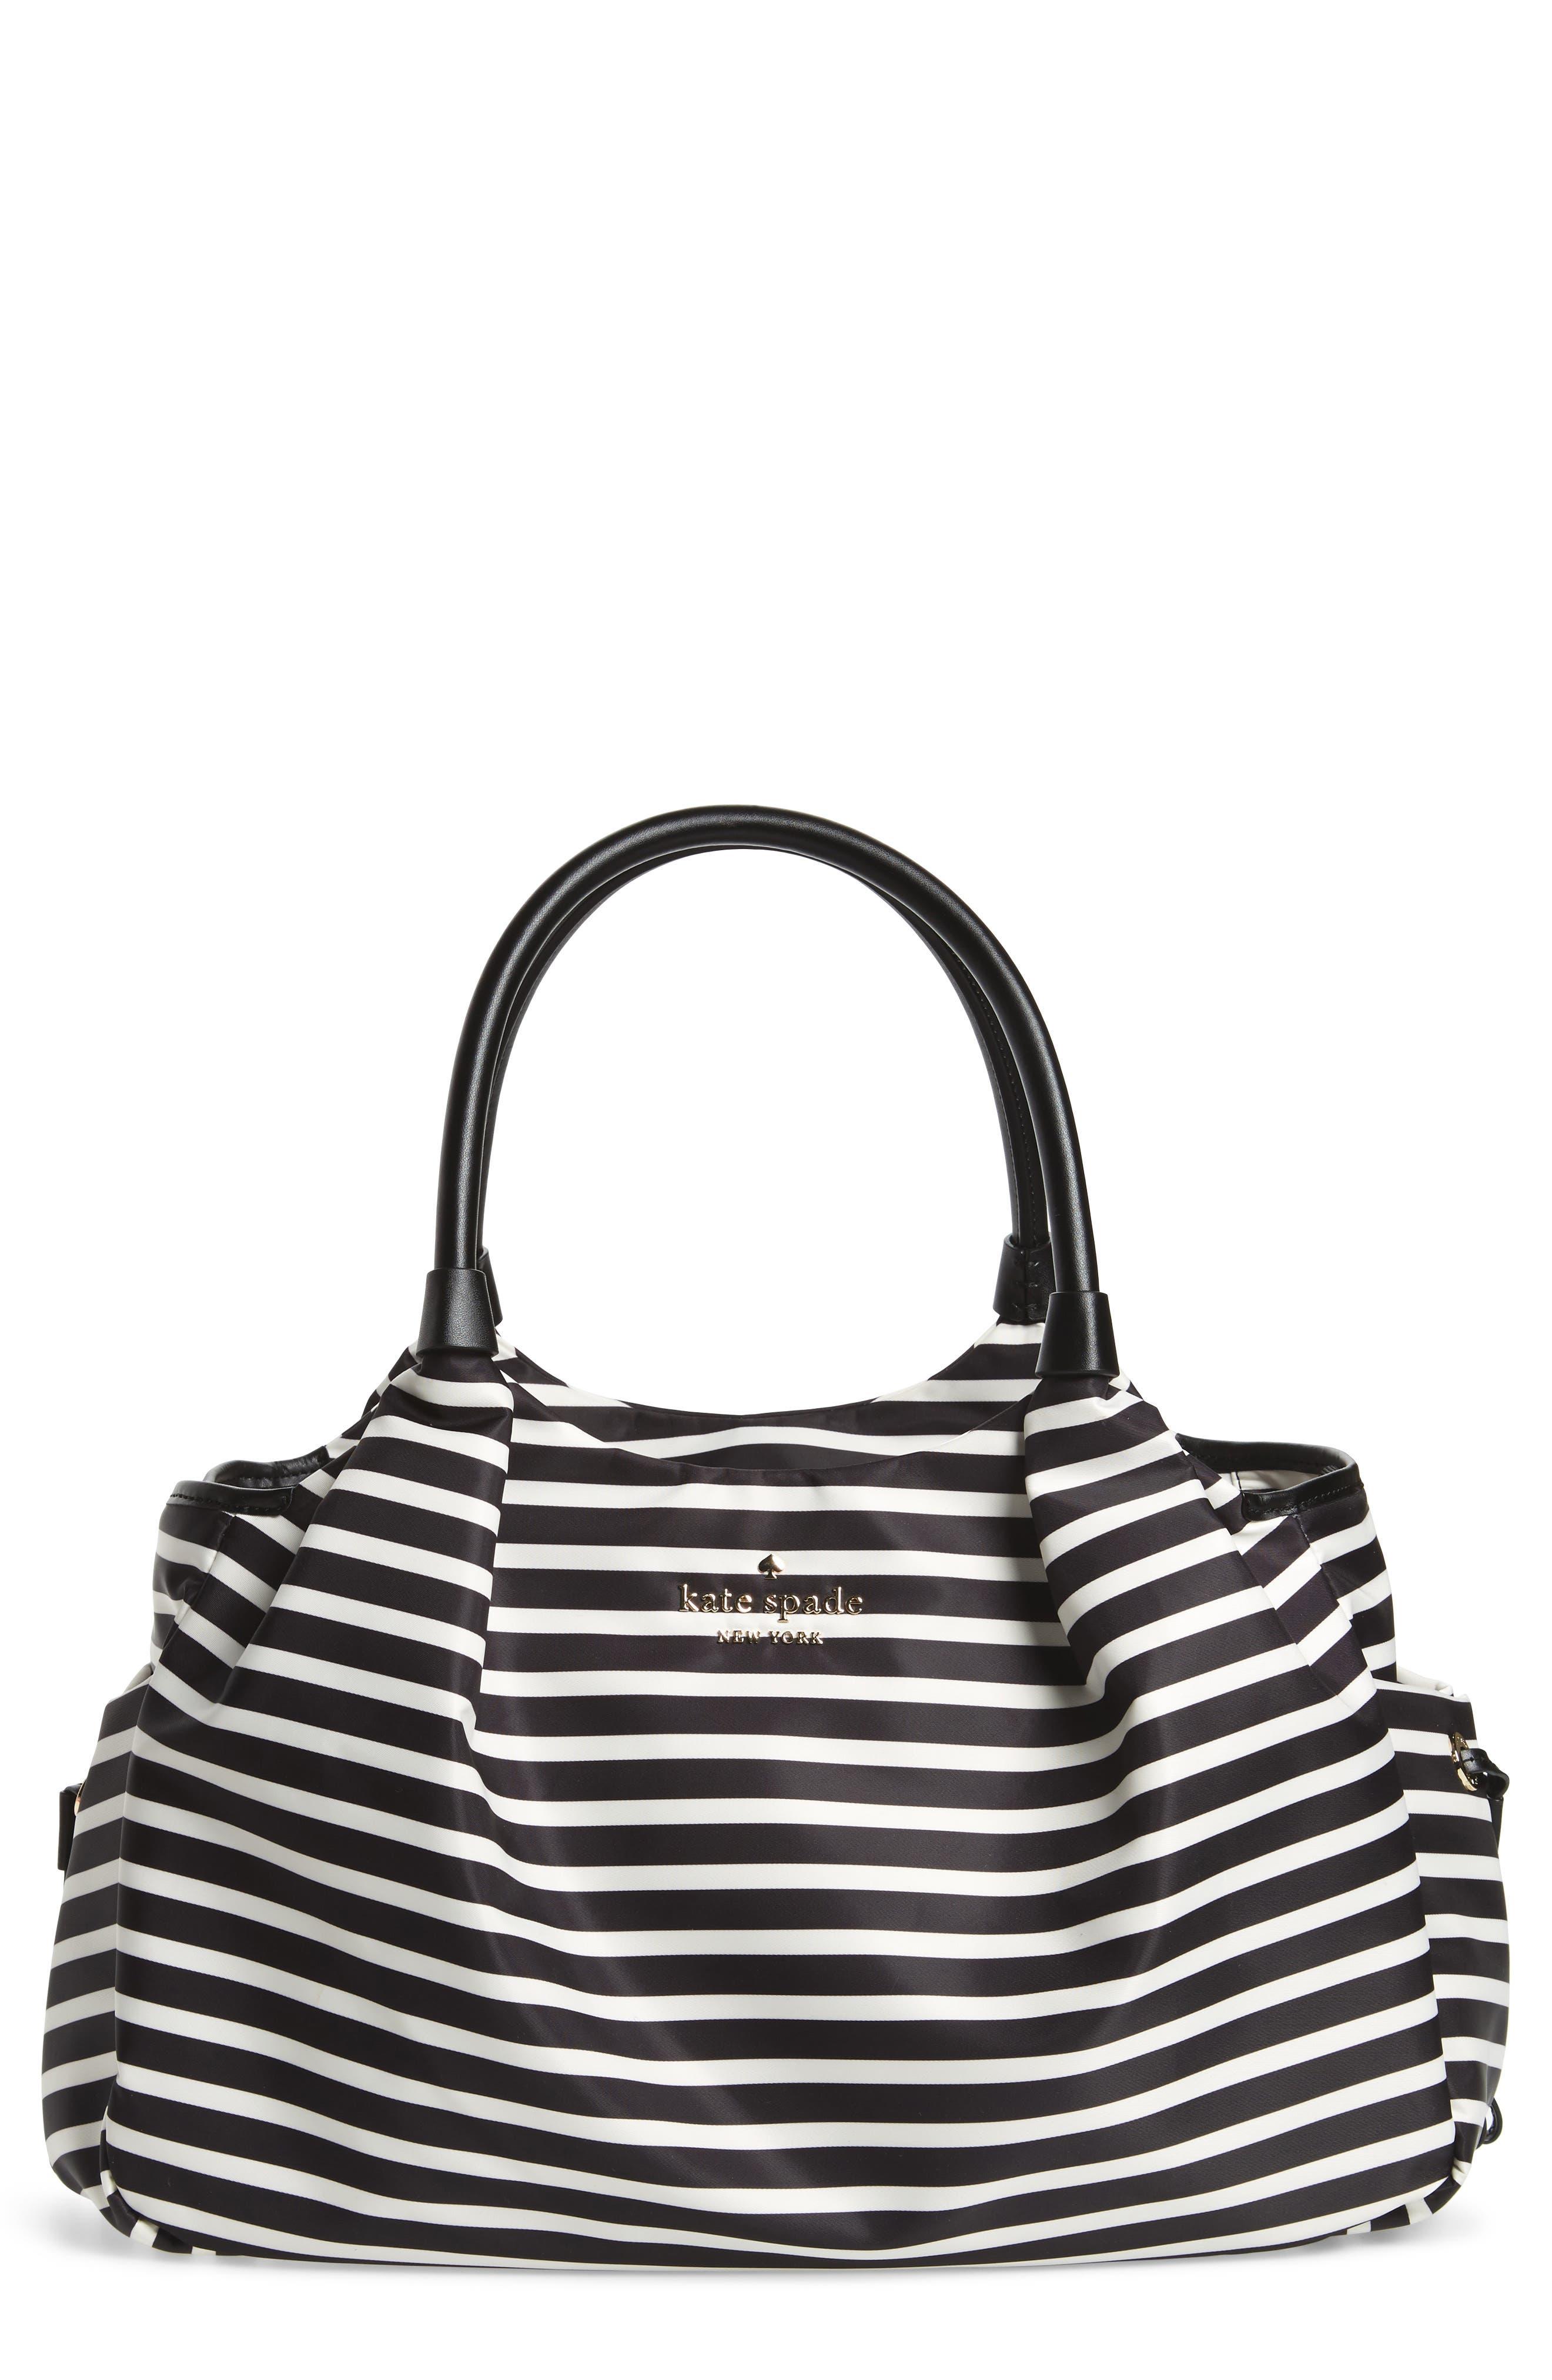 watson lane - stevie diaper bag,                         Main,                         color, BLACK/ CLOTTED CREAM